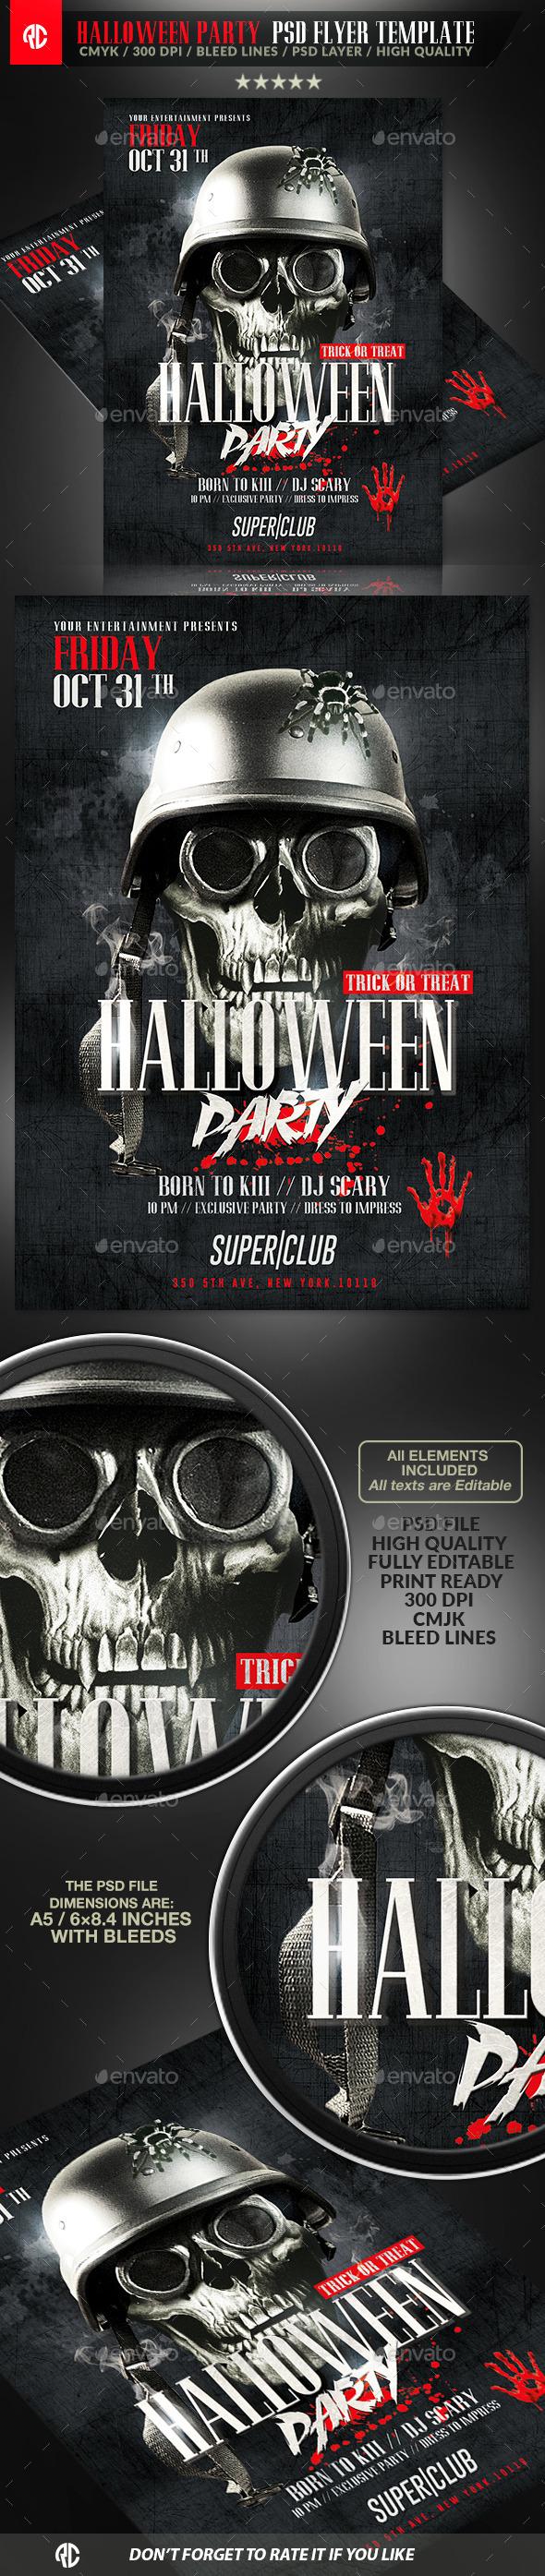 Classy Halloween Party | Flyer Template - Flyers Print Templates